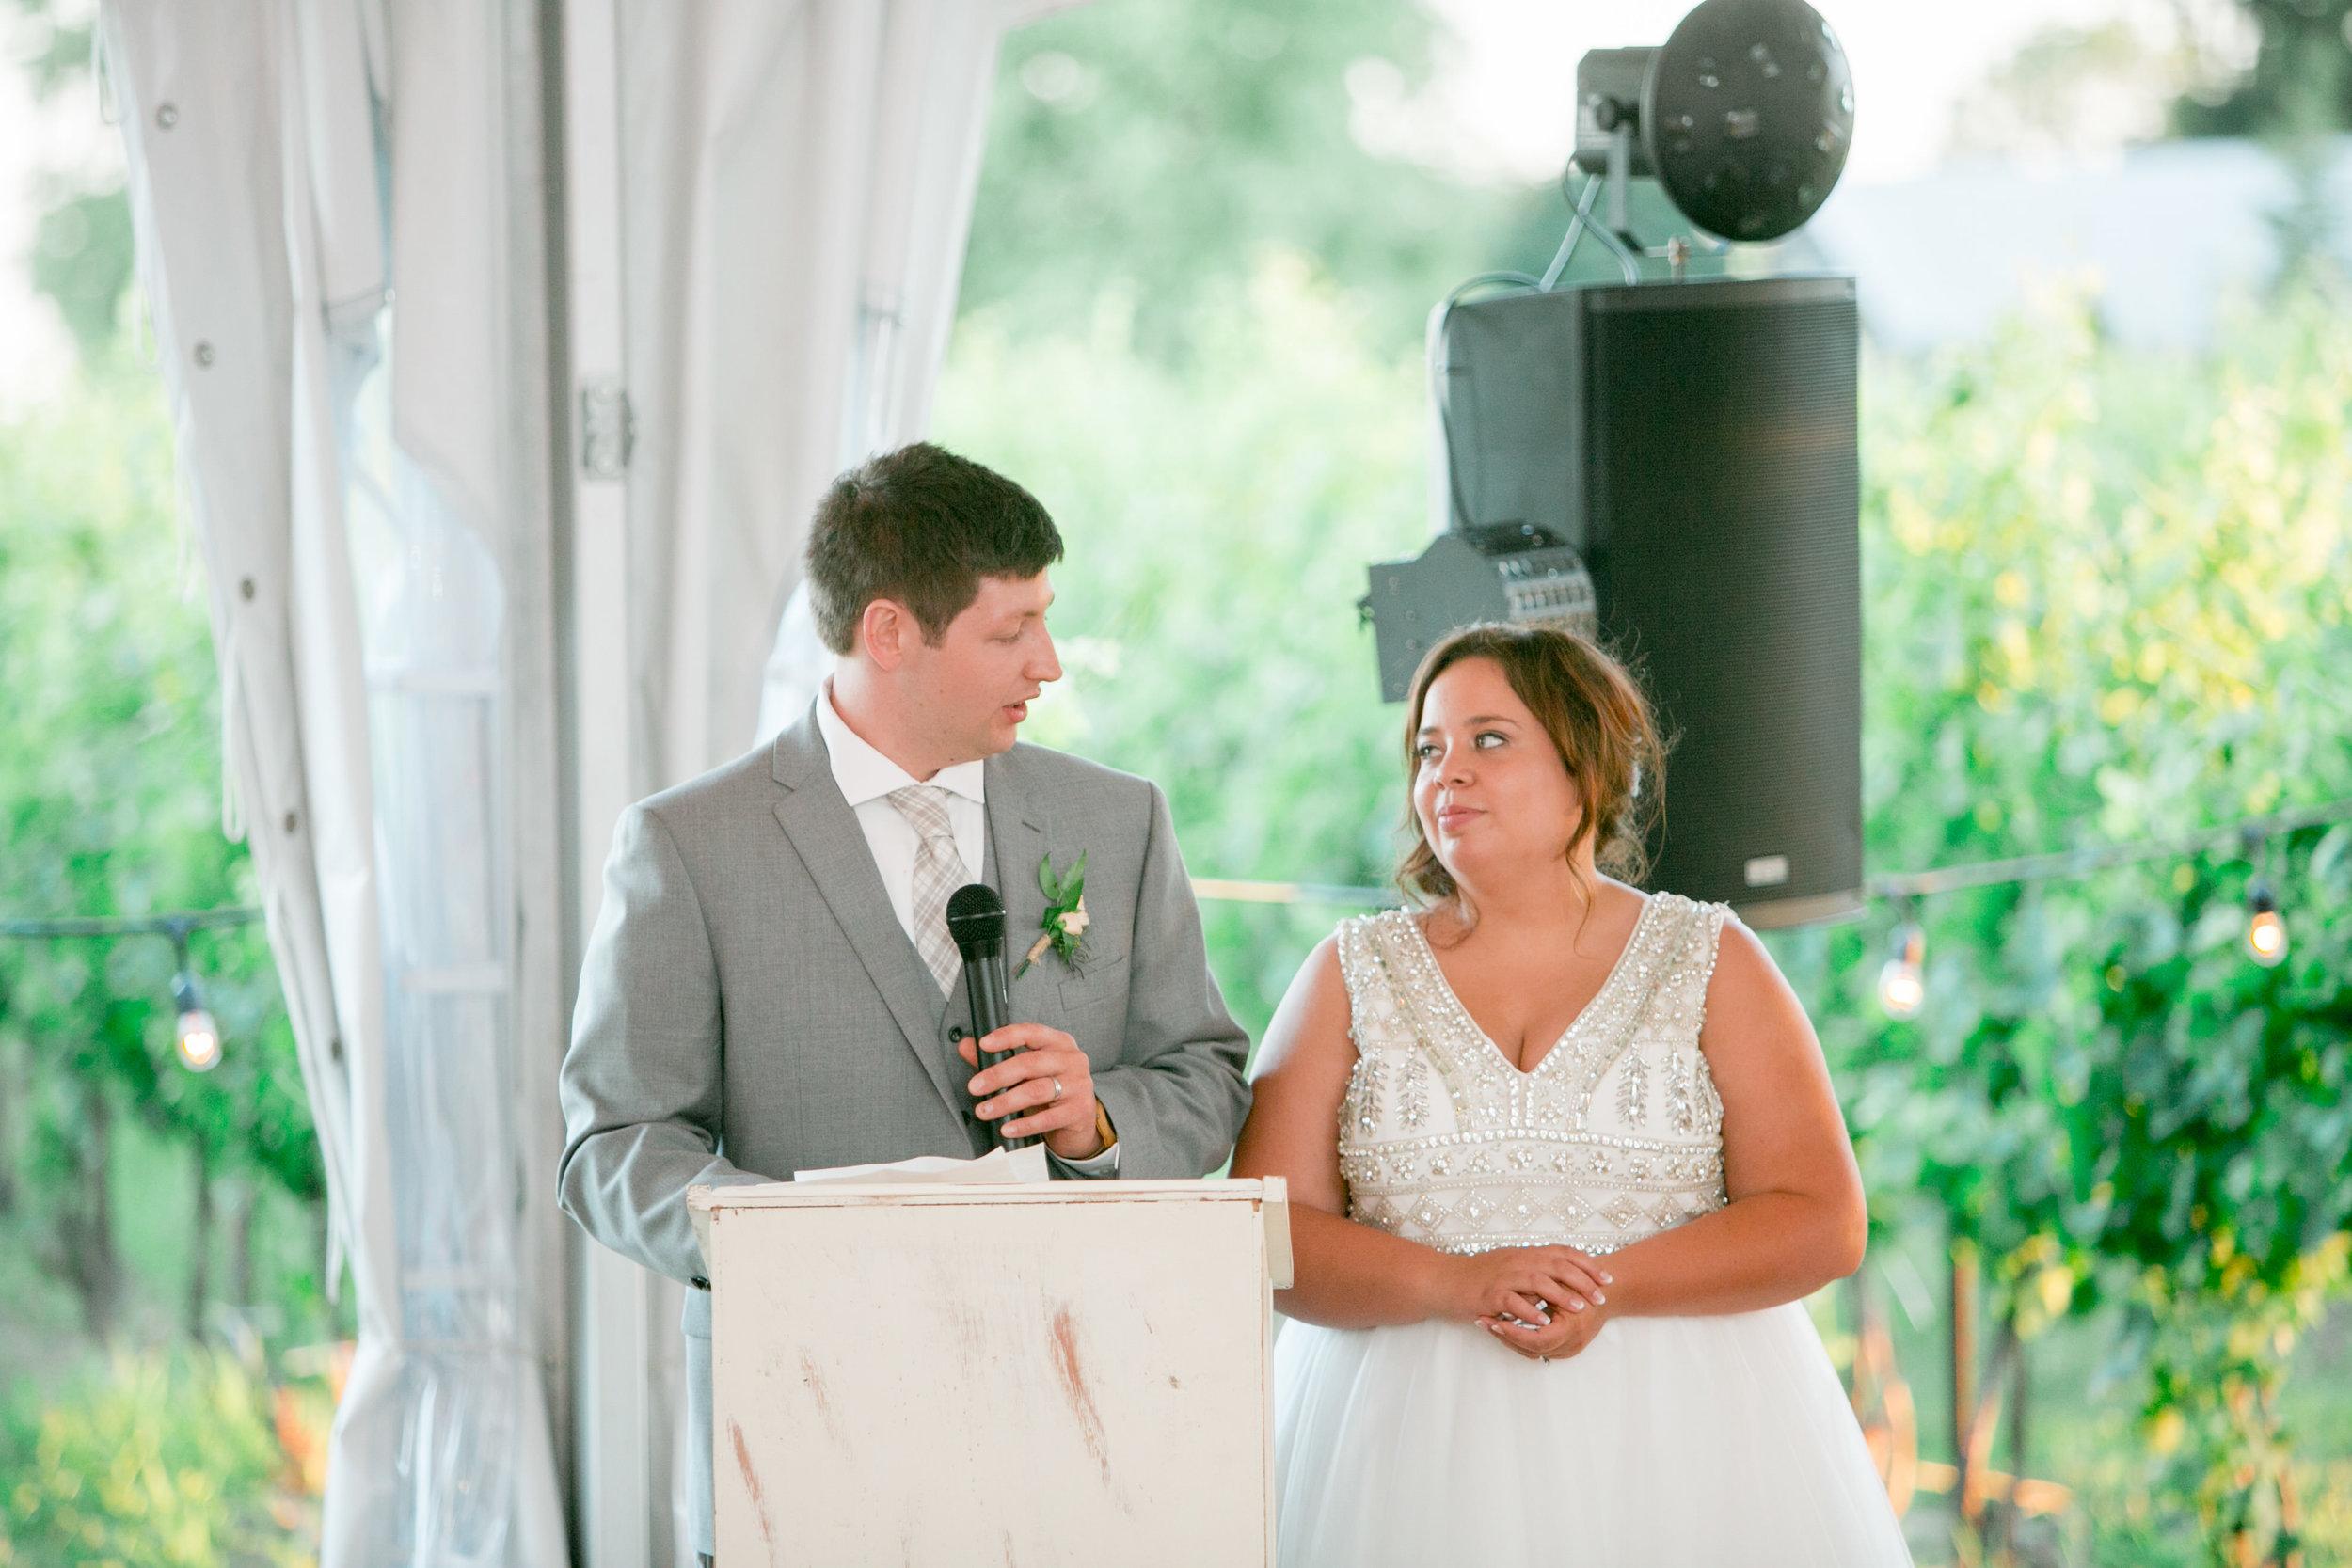 Kimberley + Cameron - Daniel Ricci Weddings - High Res. Finals-631.jpg